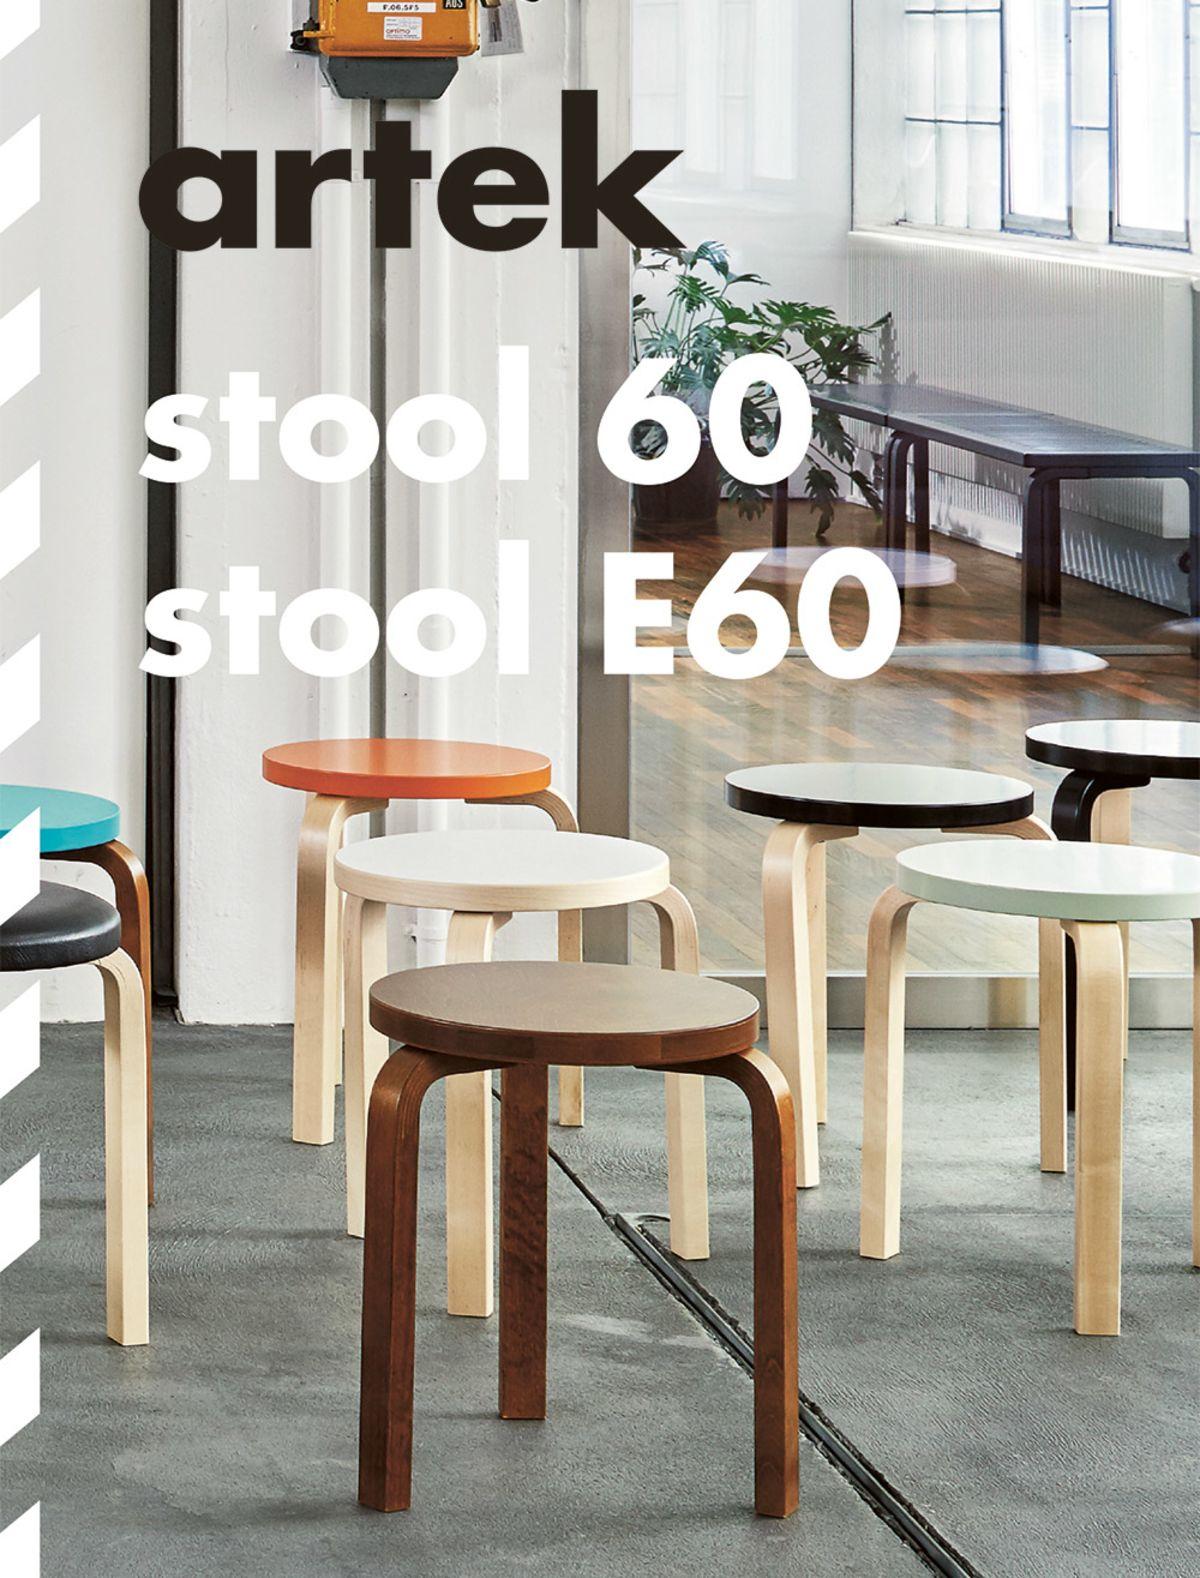 Artek_Stool_60_E60_Preview